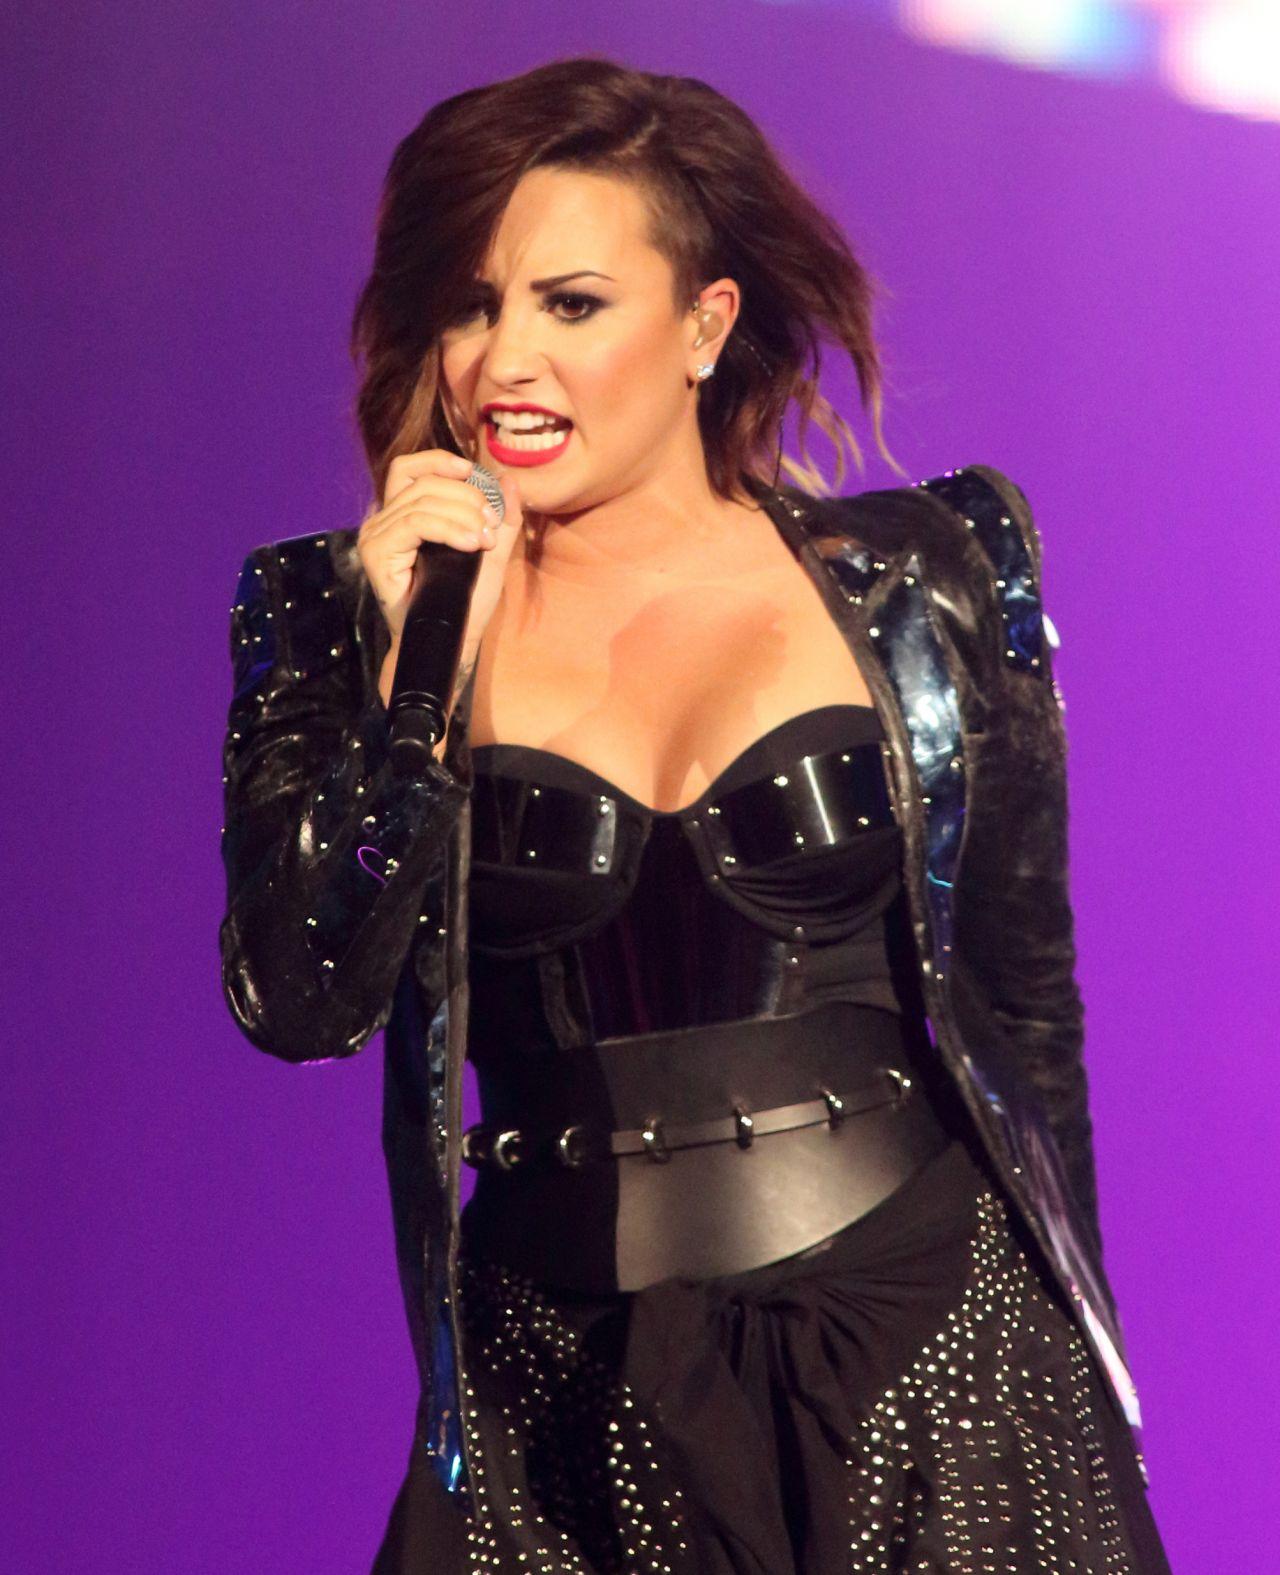 Demi Lovato Performing in Baltimore - September 2014